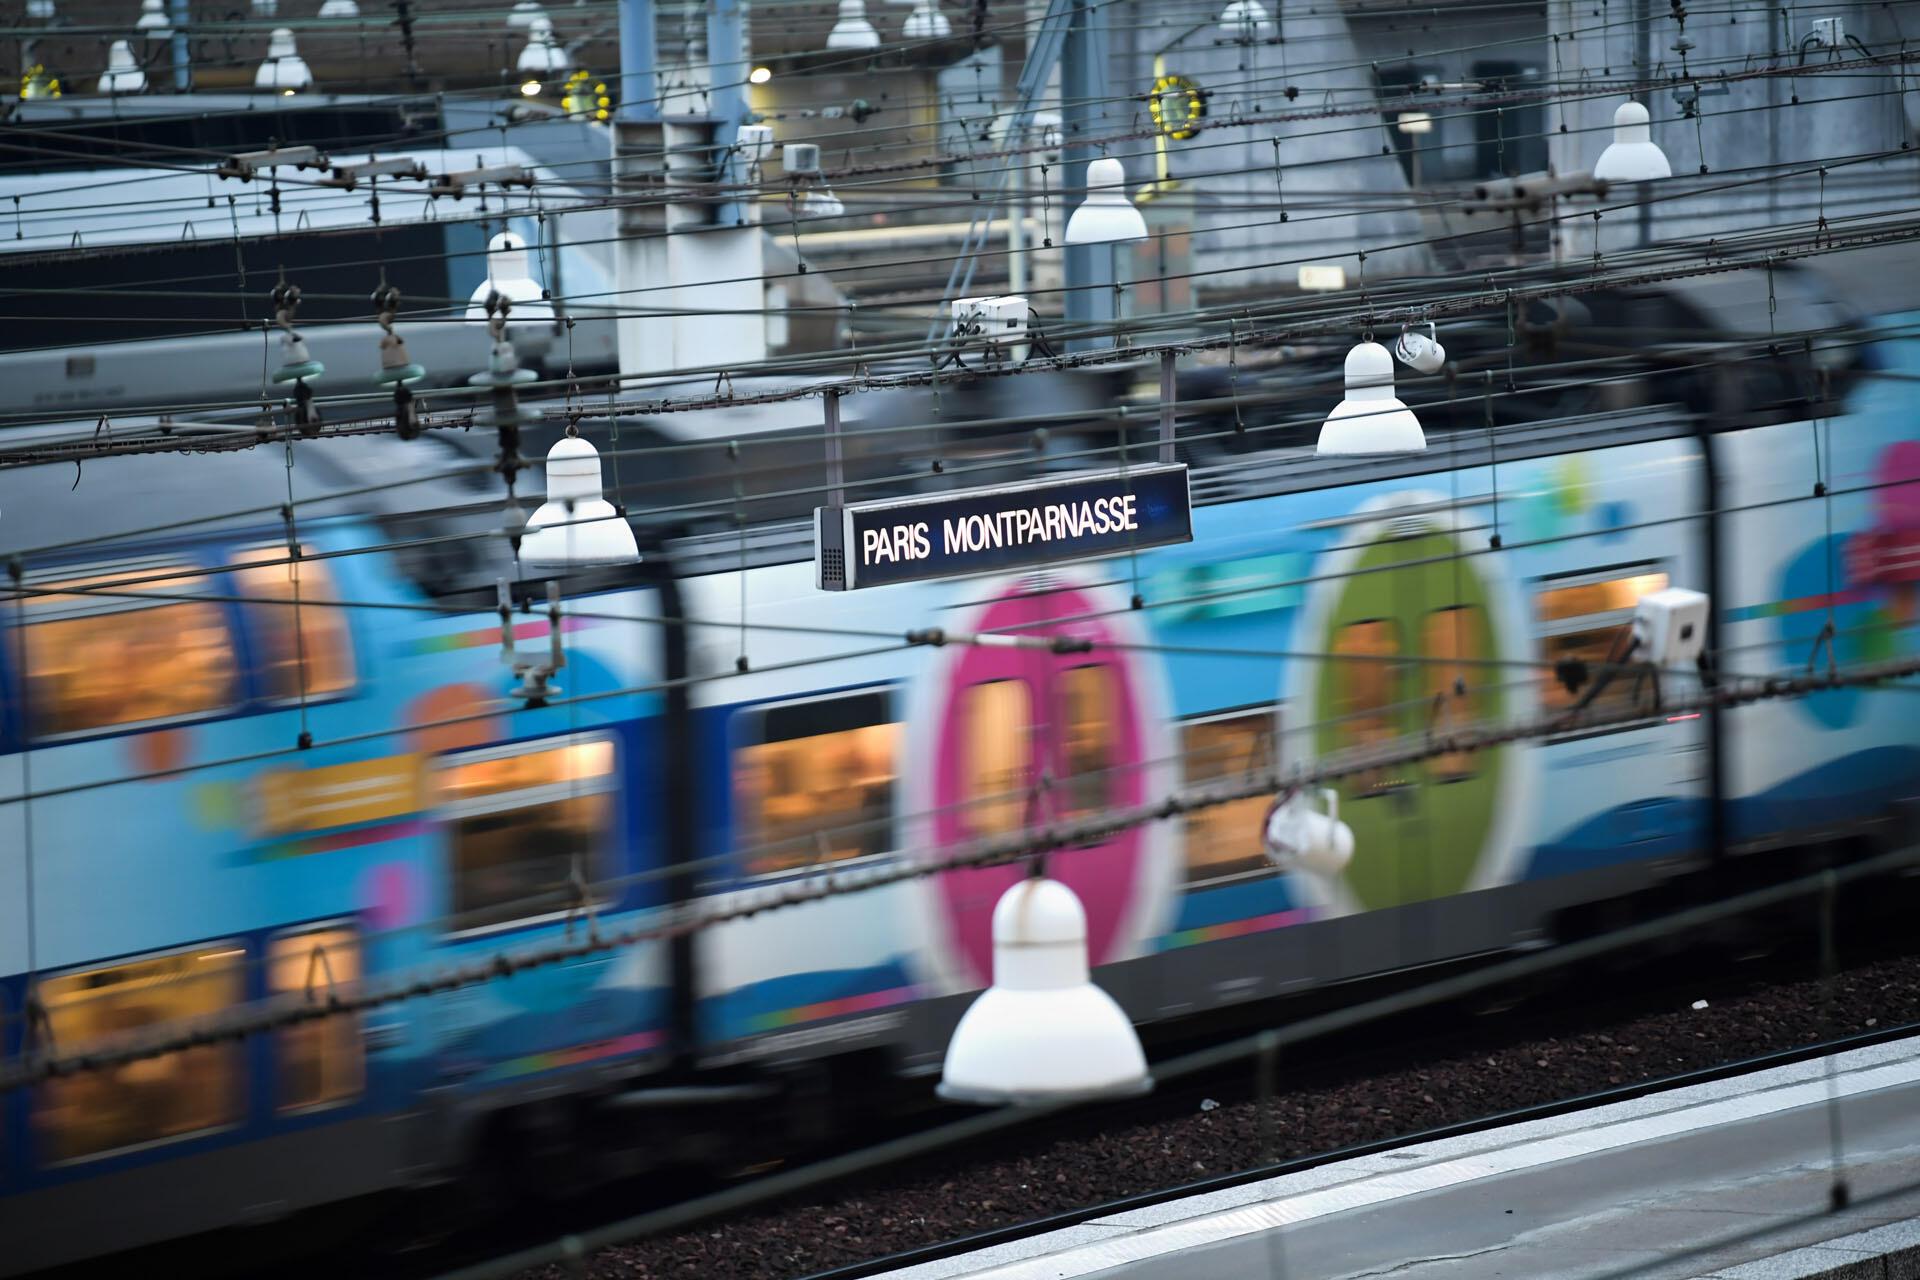 A train arrives at Montparnasse station in Paris.